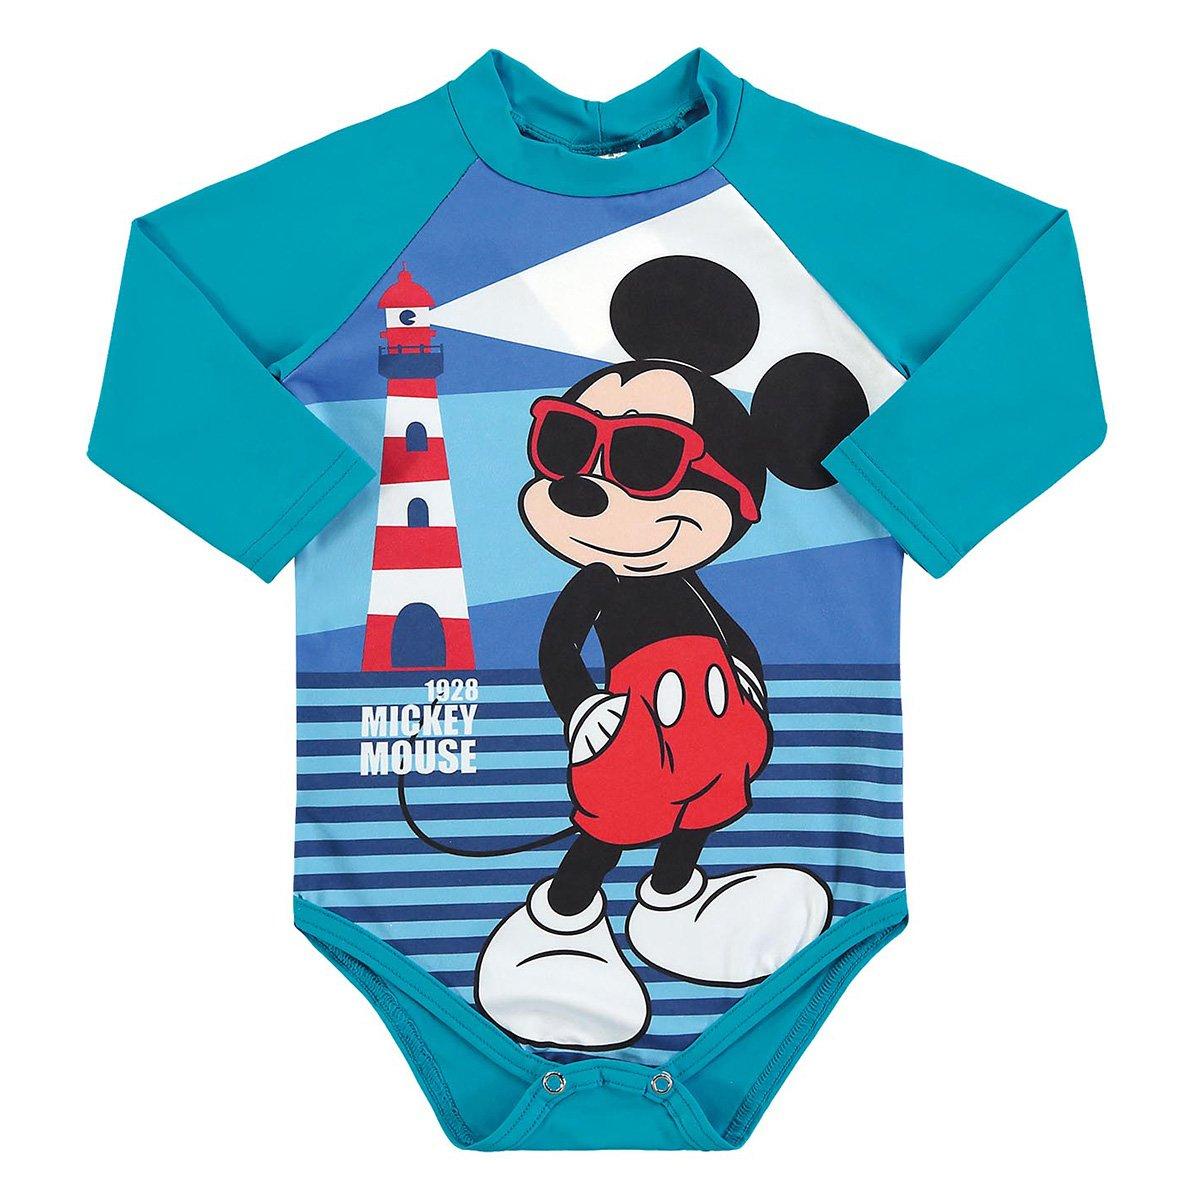 Macacão Bebê Marlan Body Proteção UV Disney Mickey Manga Longa Masculino